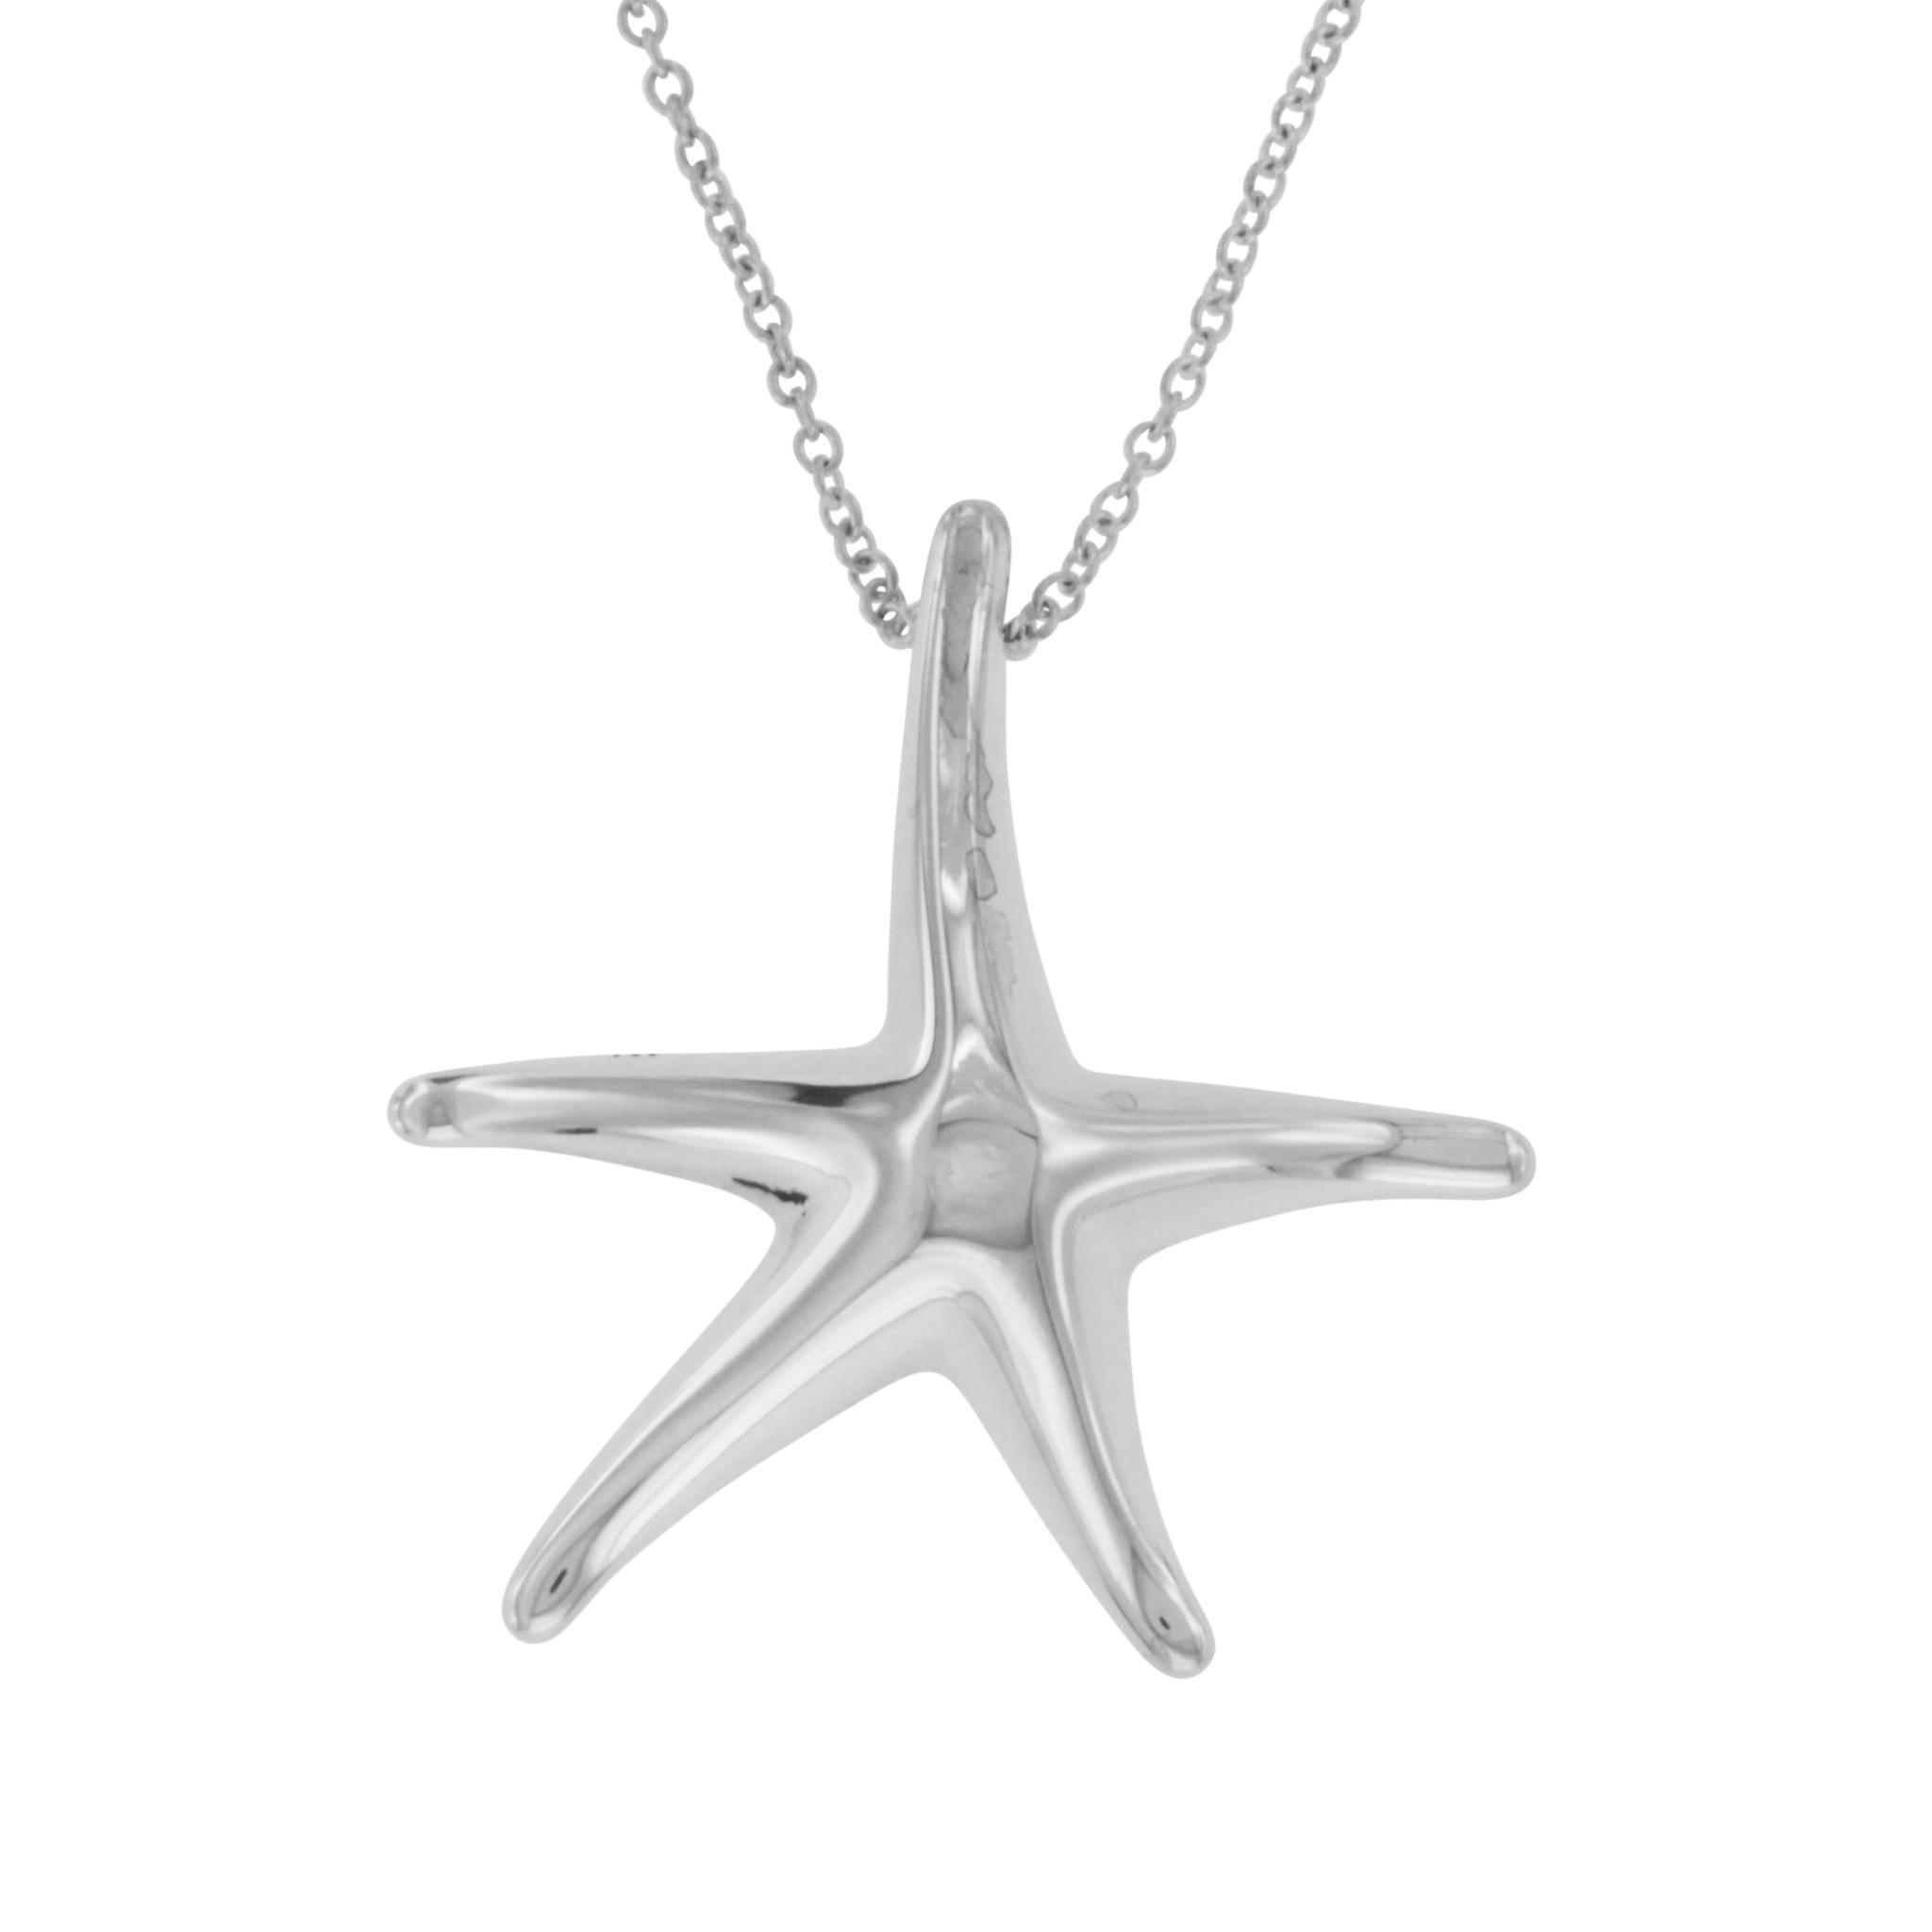 896d2f35f62ad Tiffany and Co. 925 Silver Elsa Peretti Starfish Pendant Necklace at 1stdibs